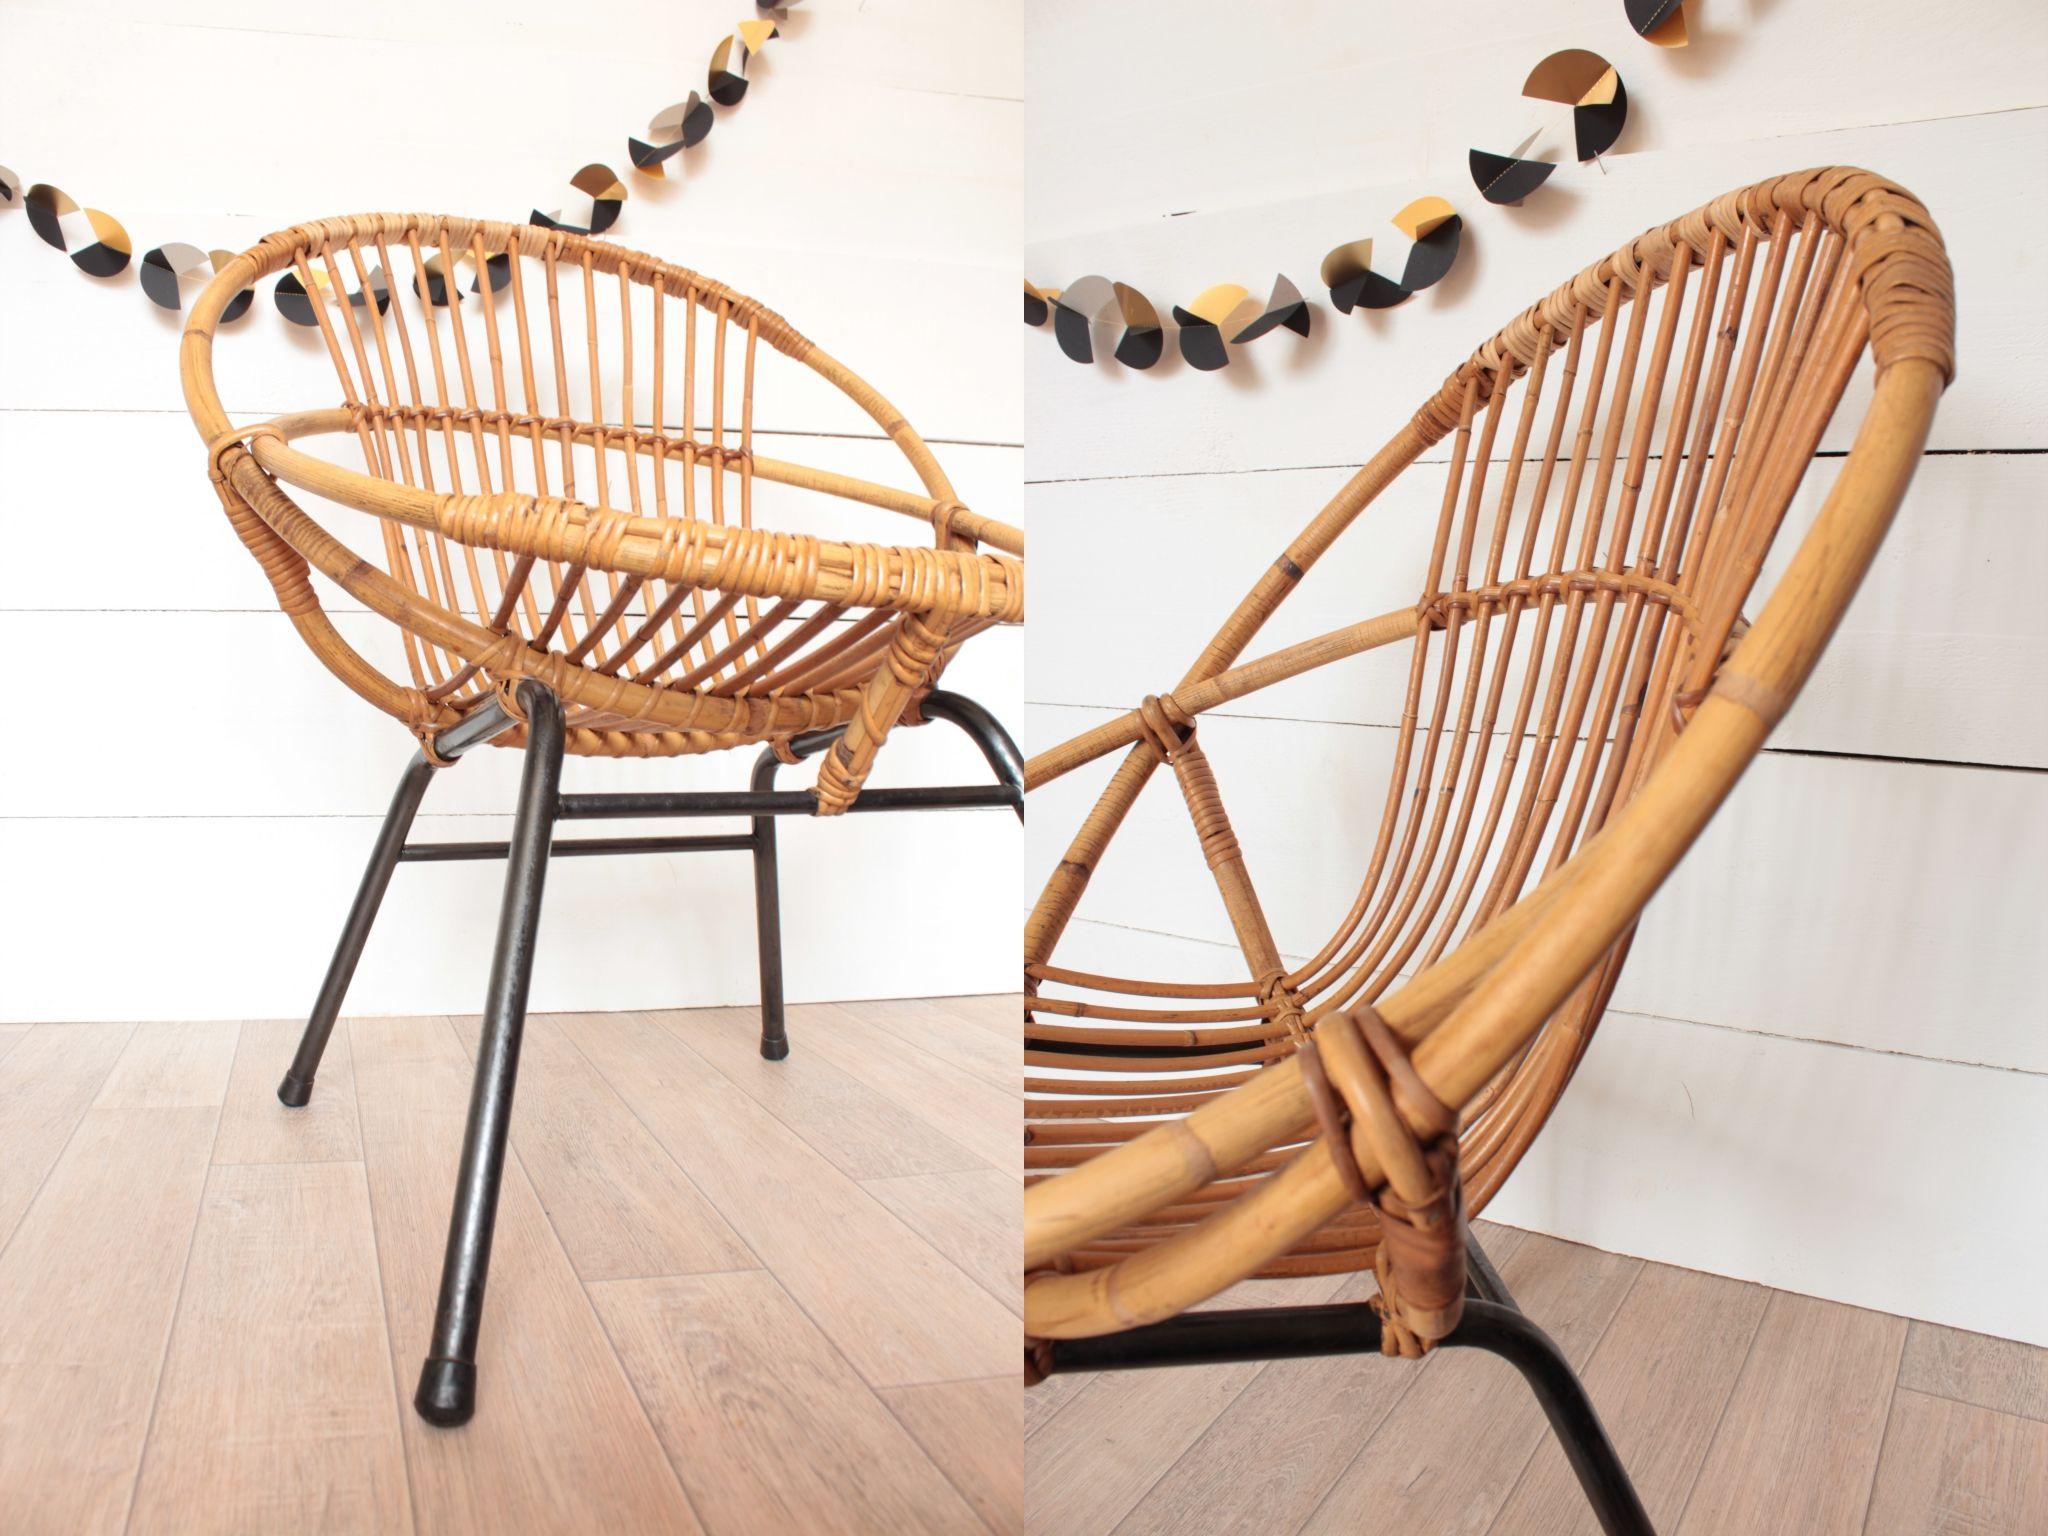 fauteuil rotin vintage trendy little - Fauteuil Rotin Vintage